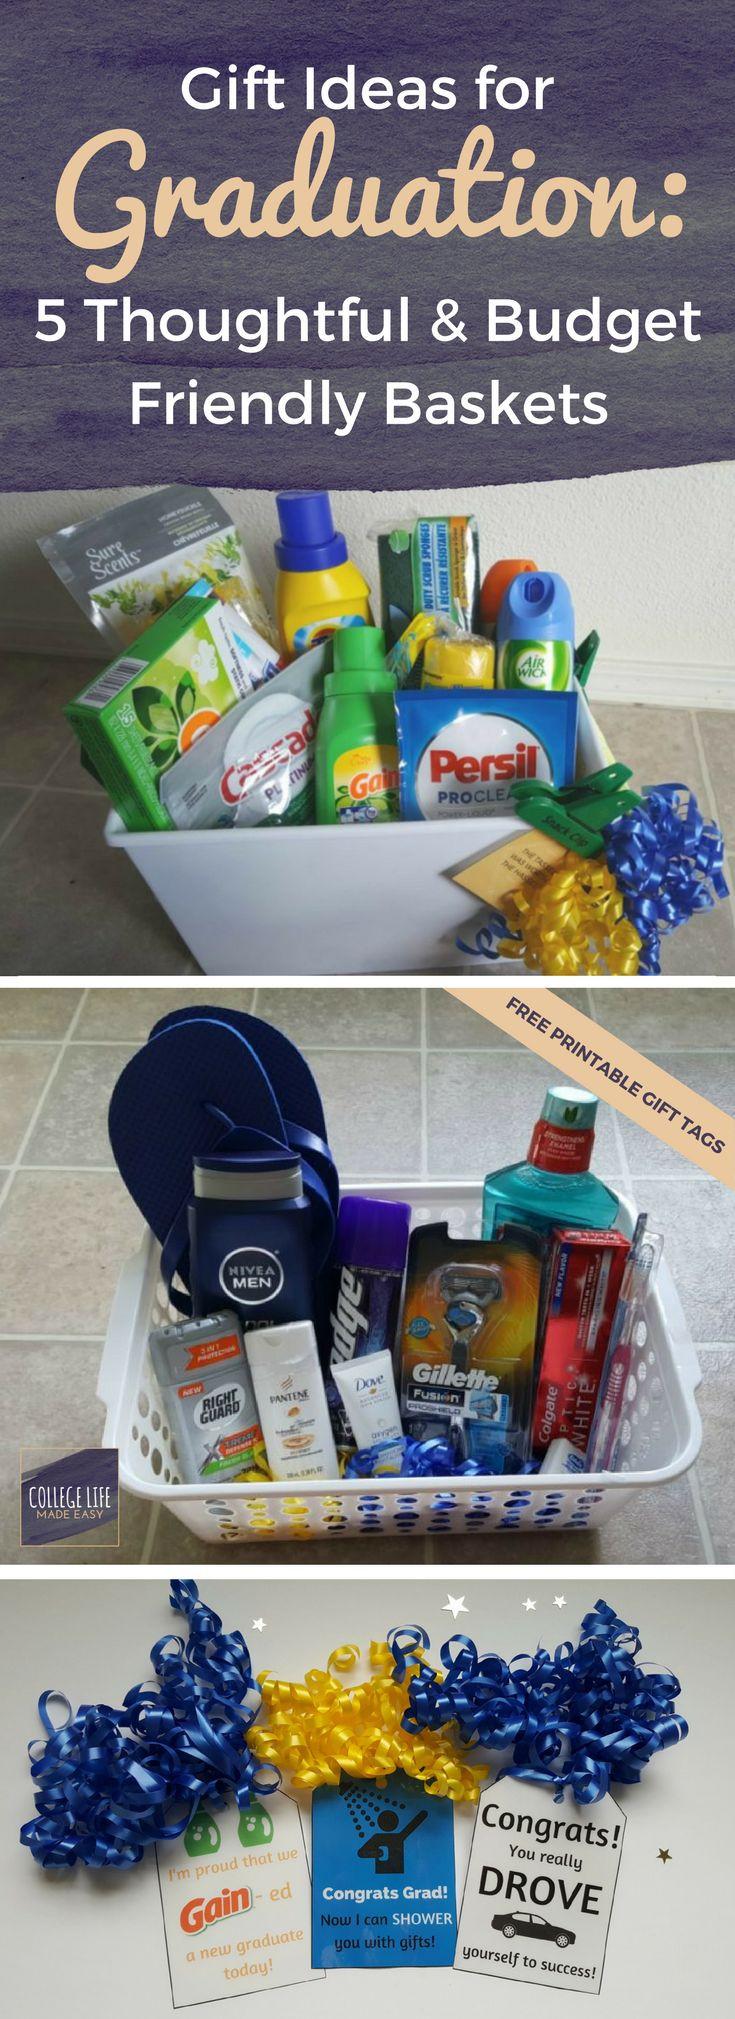 Best ideas about Girls High School Graduation Gift Ideas . Save or Pin 141 best images about Graduation Gift Ideas on Pinterest Now.